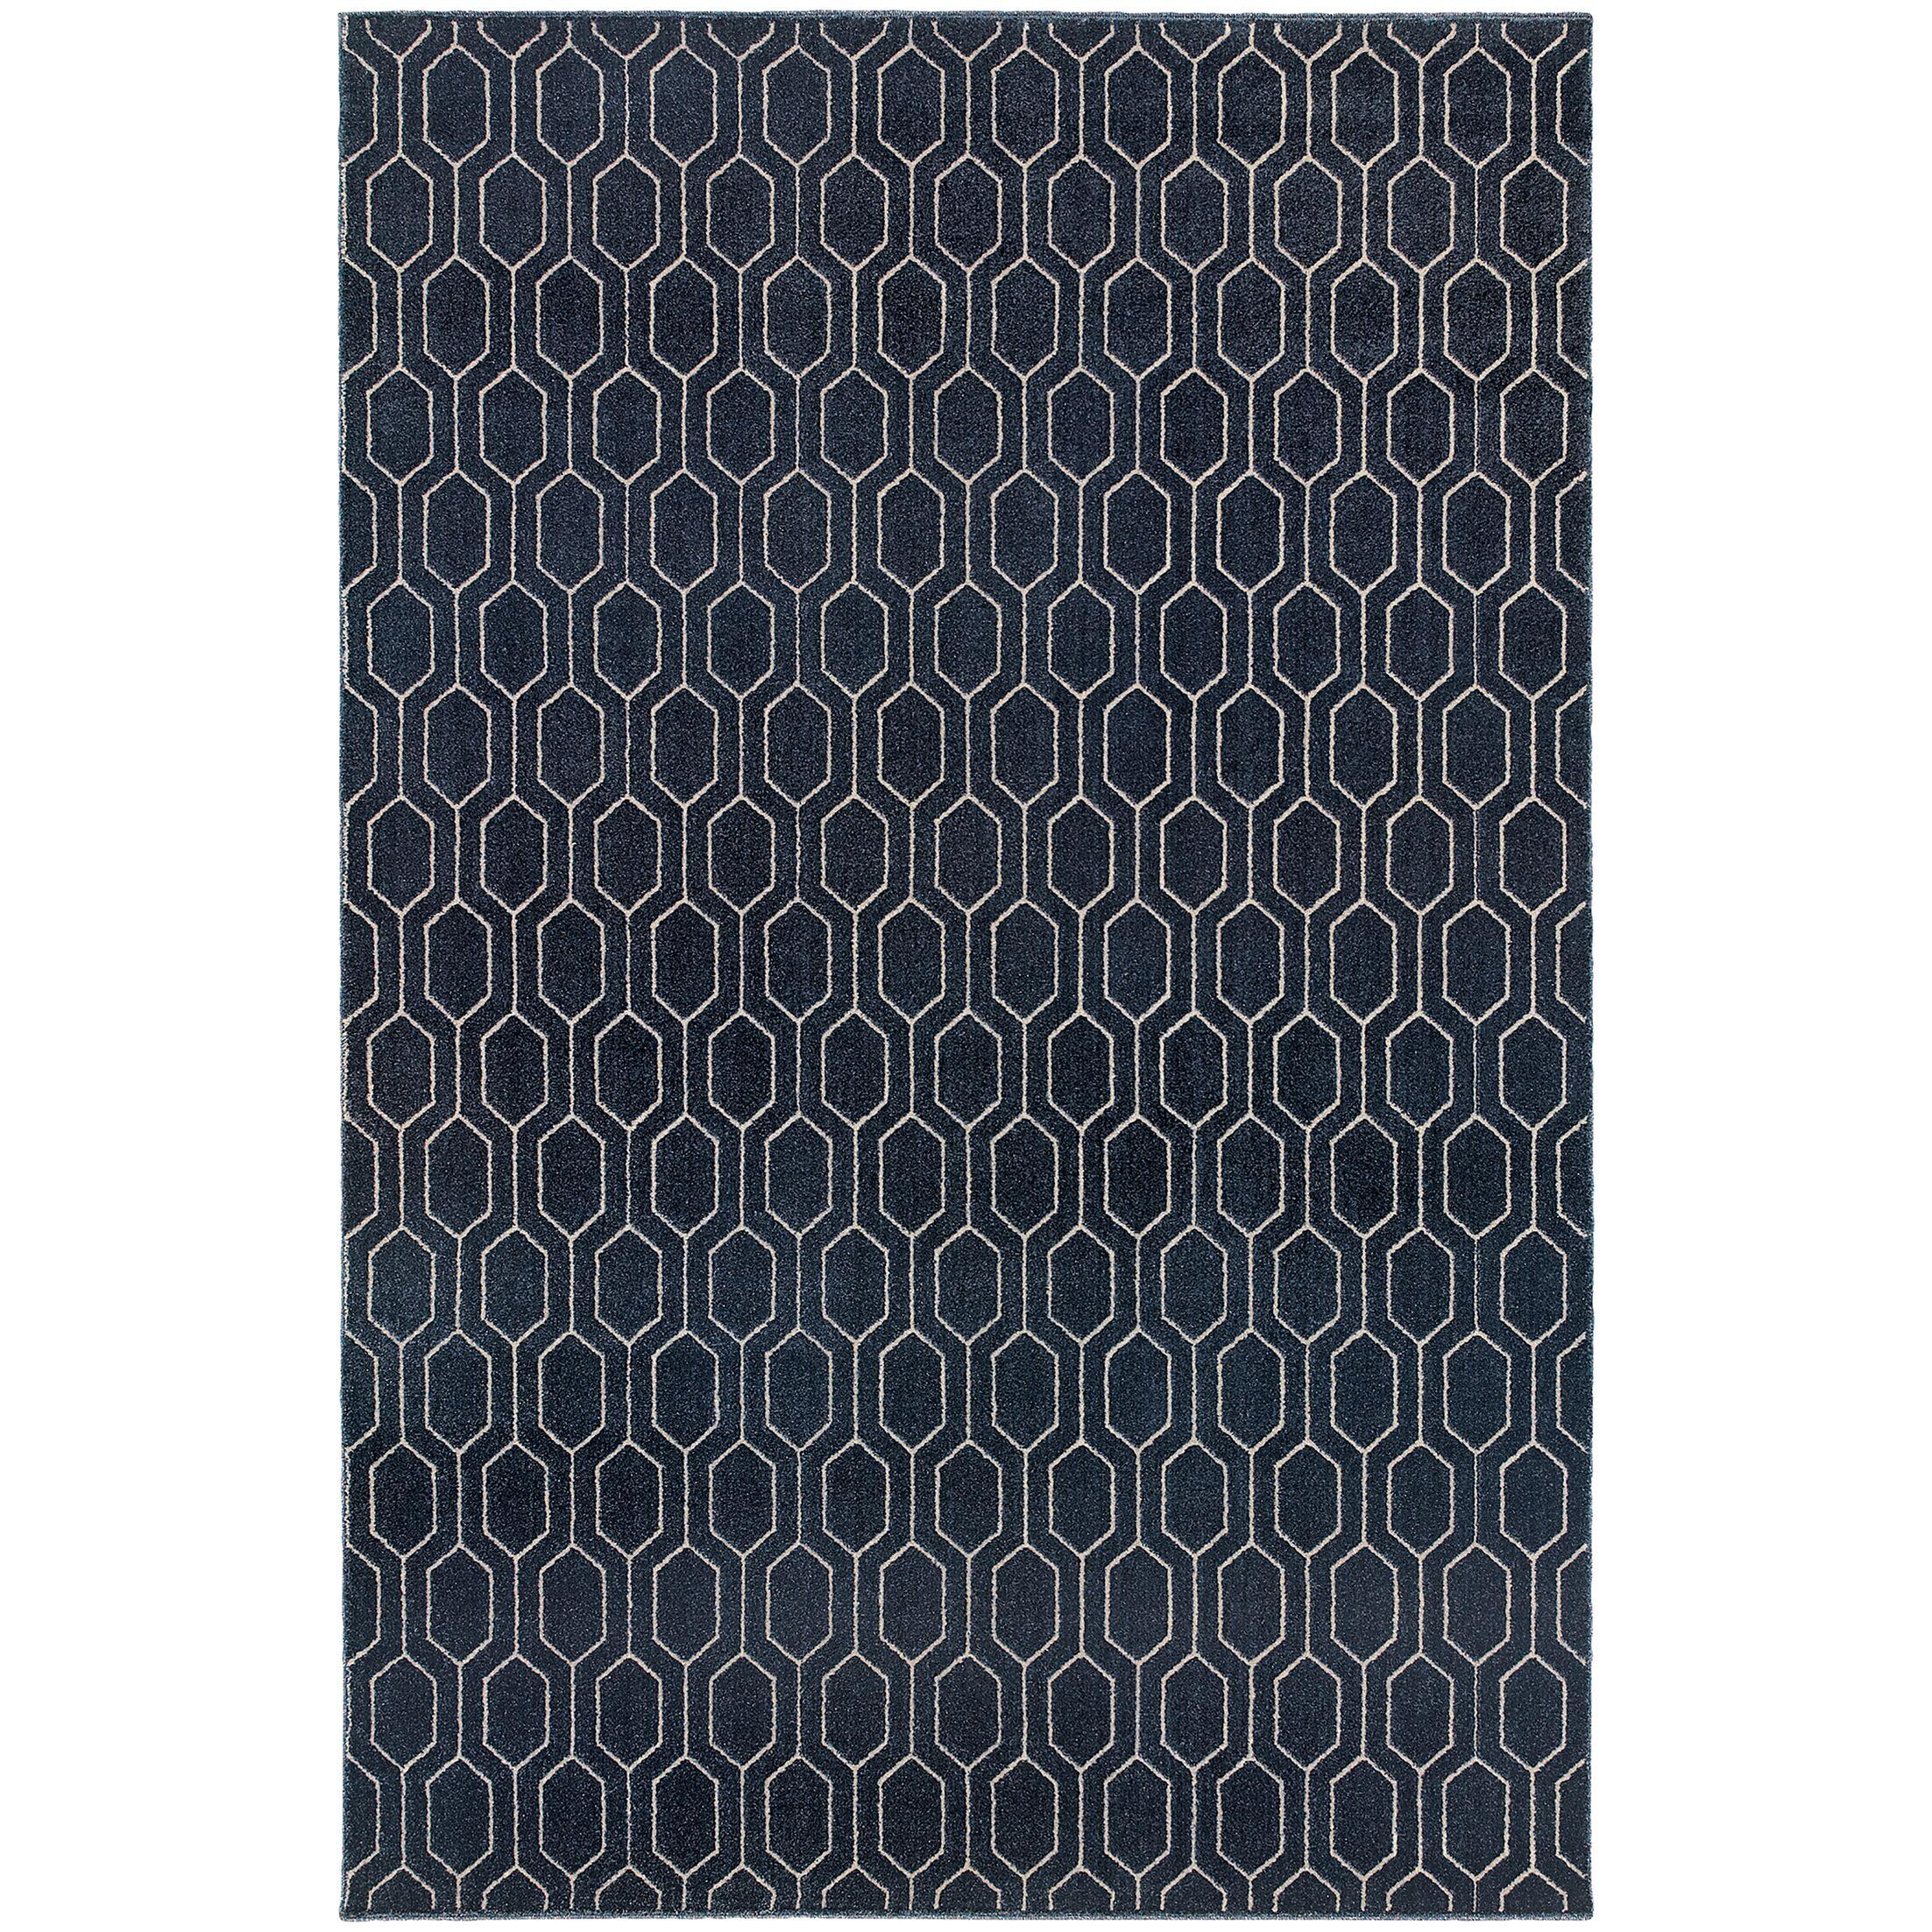 Oren Navy/Grey Area Rug Rug Size: Rectangle 6'7